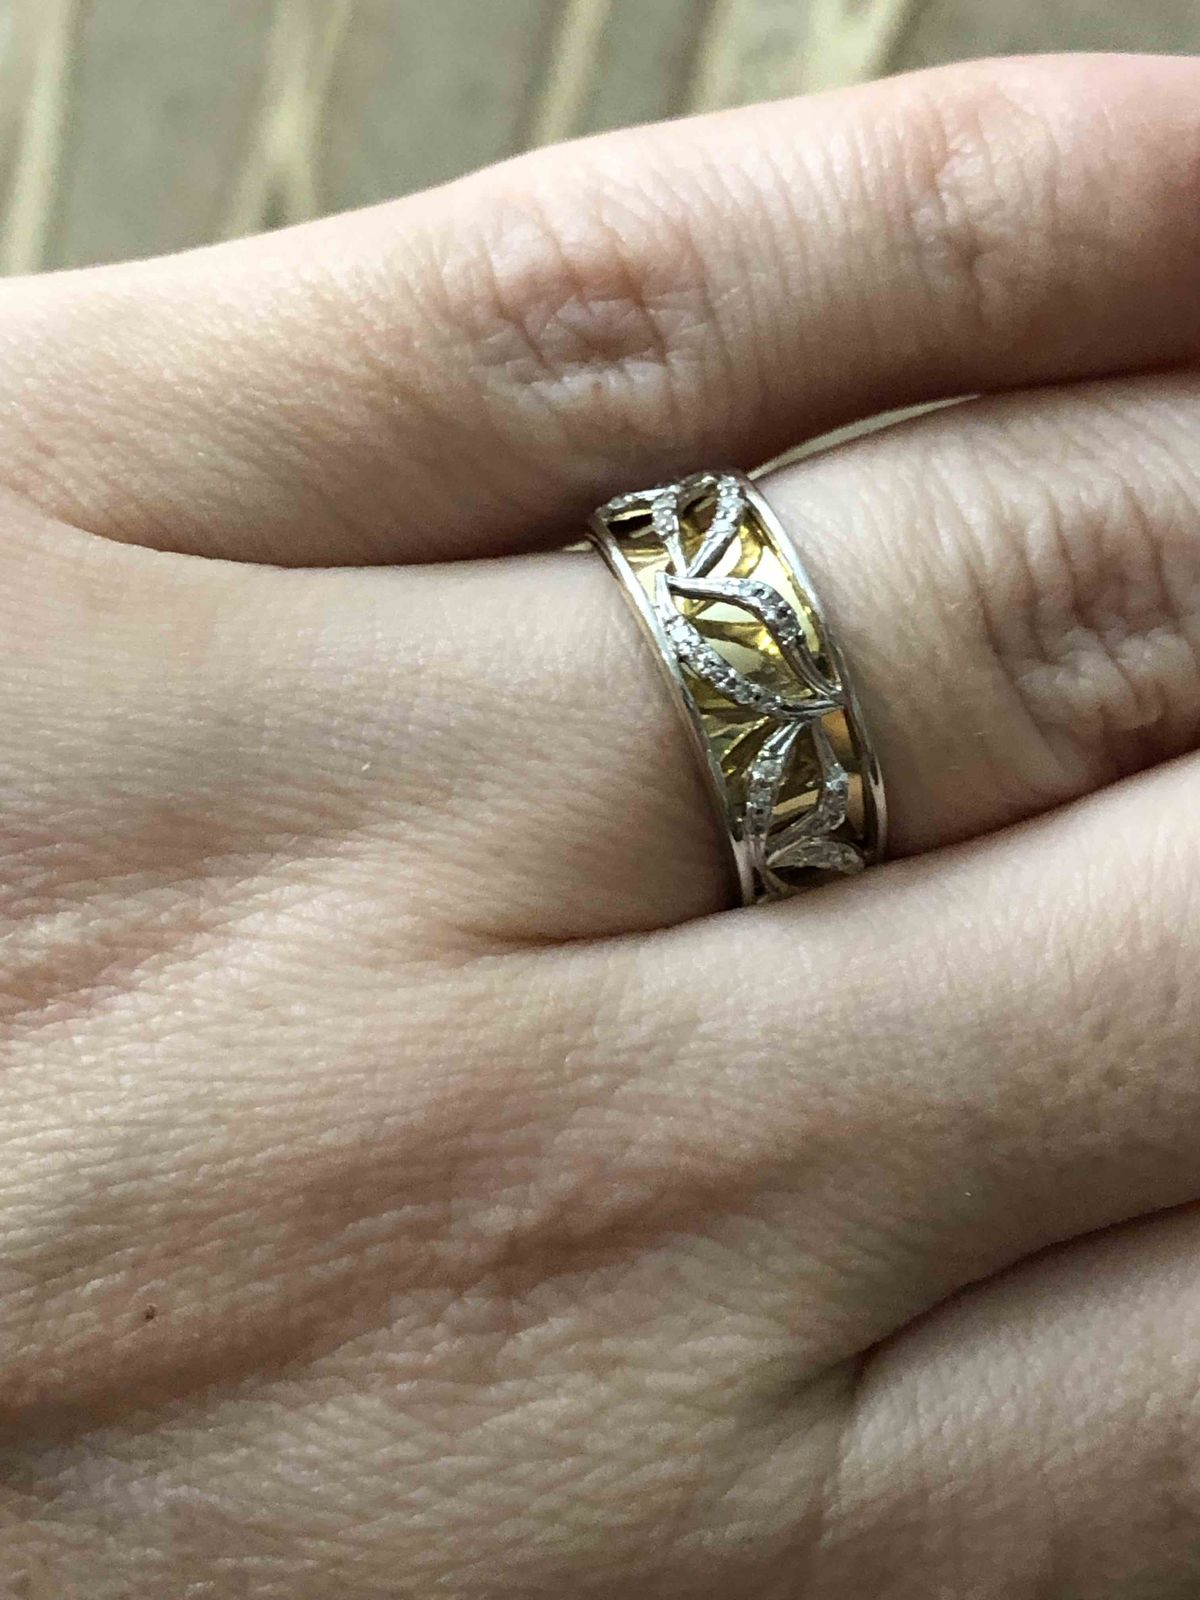 💍👍😍 Безумно красивое кольцо!